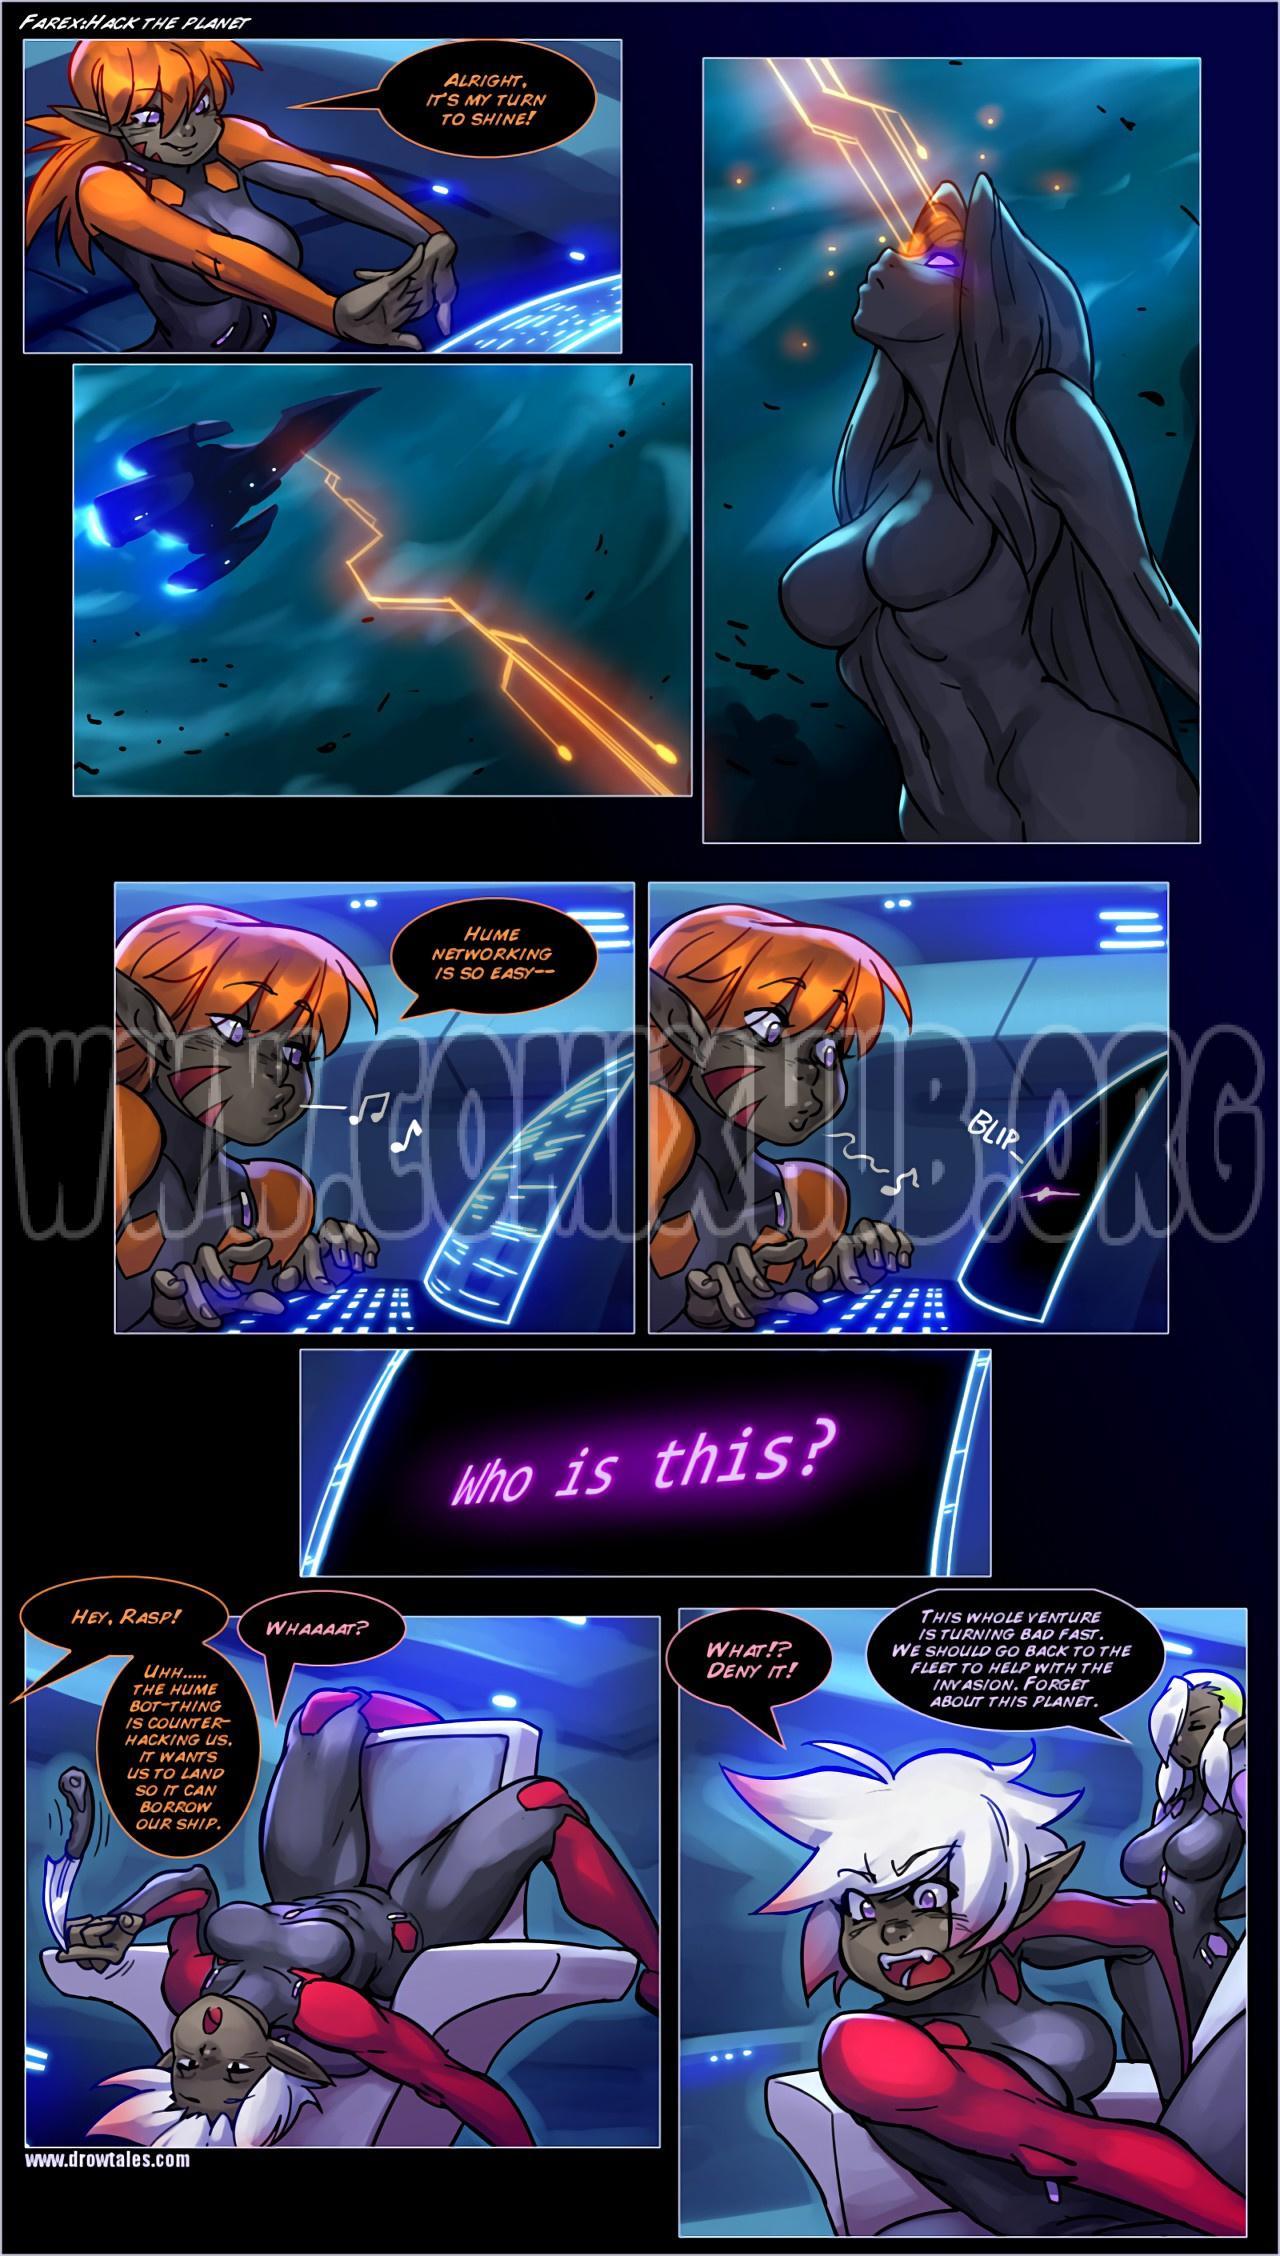 Drowtales Space Age 8 porn comics Oral sex, Anal Sex, cunnilingus, fingering, Futanari, Lesbians, Masturbation, Sci-Fi, Straight, Threesome, X-Ray